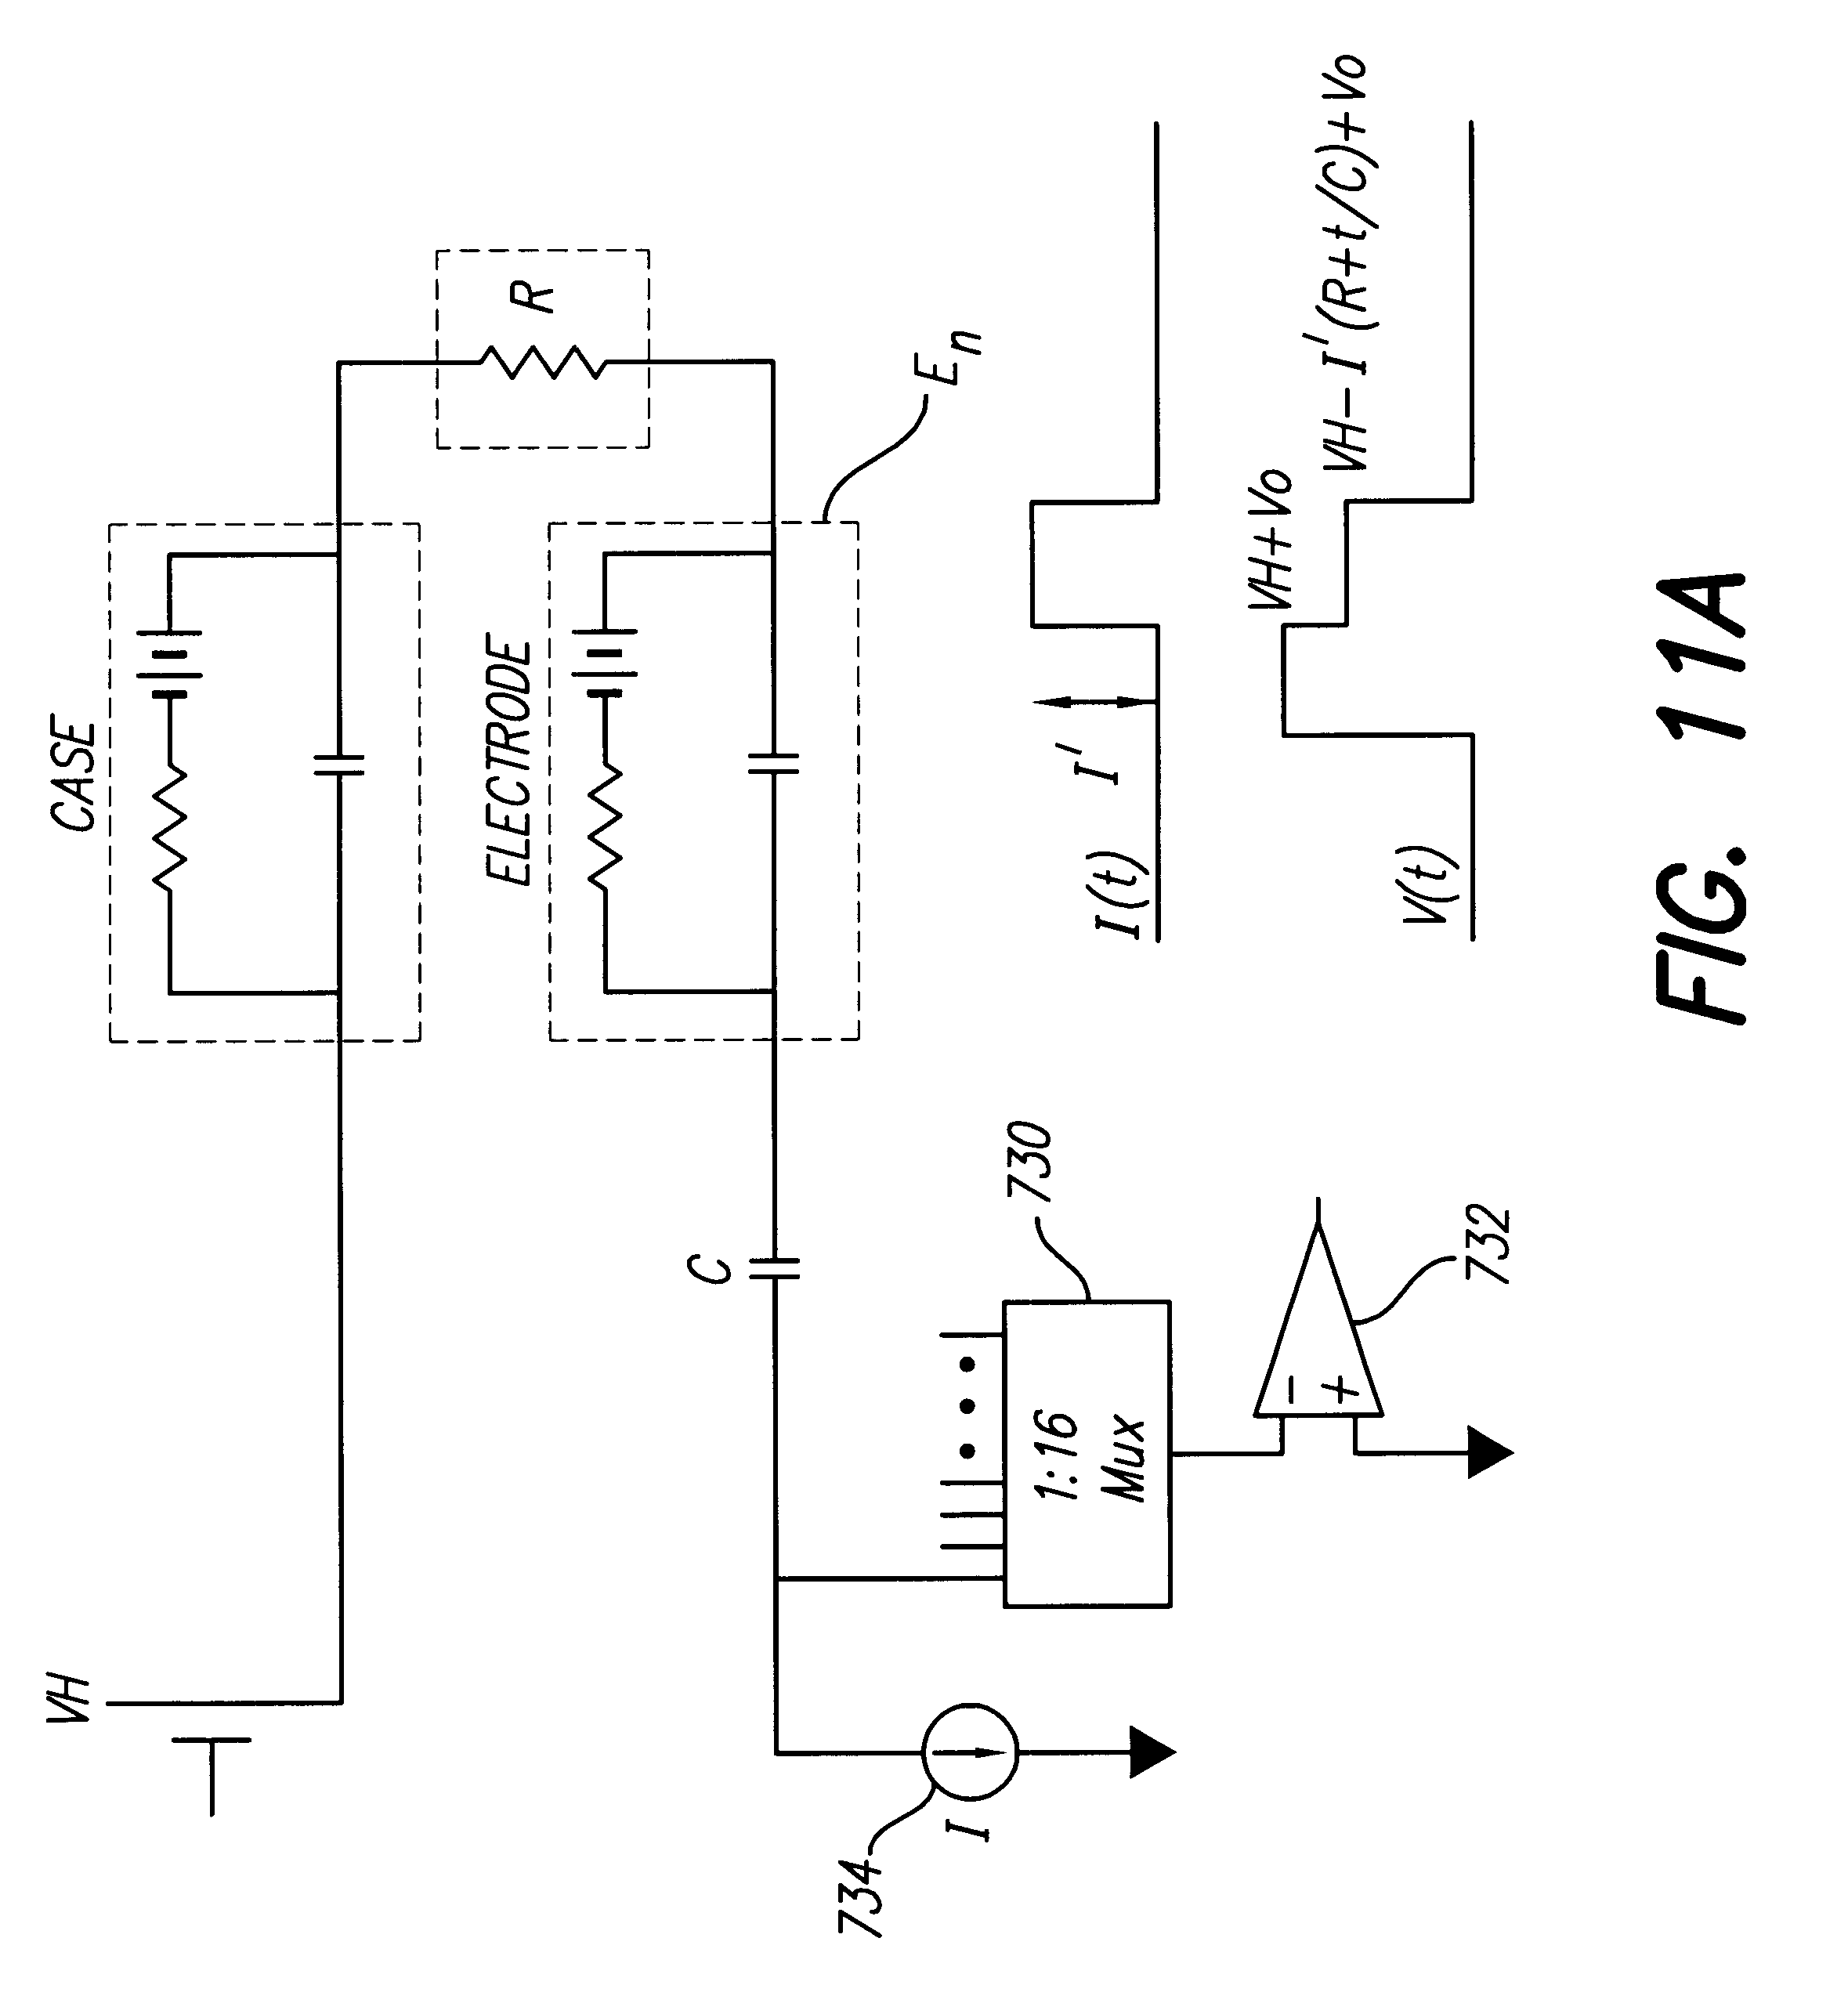 Patent Us 6516227 B1 Pulse Position Modulated By Multiplexor Modulator Demodulator Circuit 0 Petitions